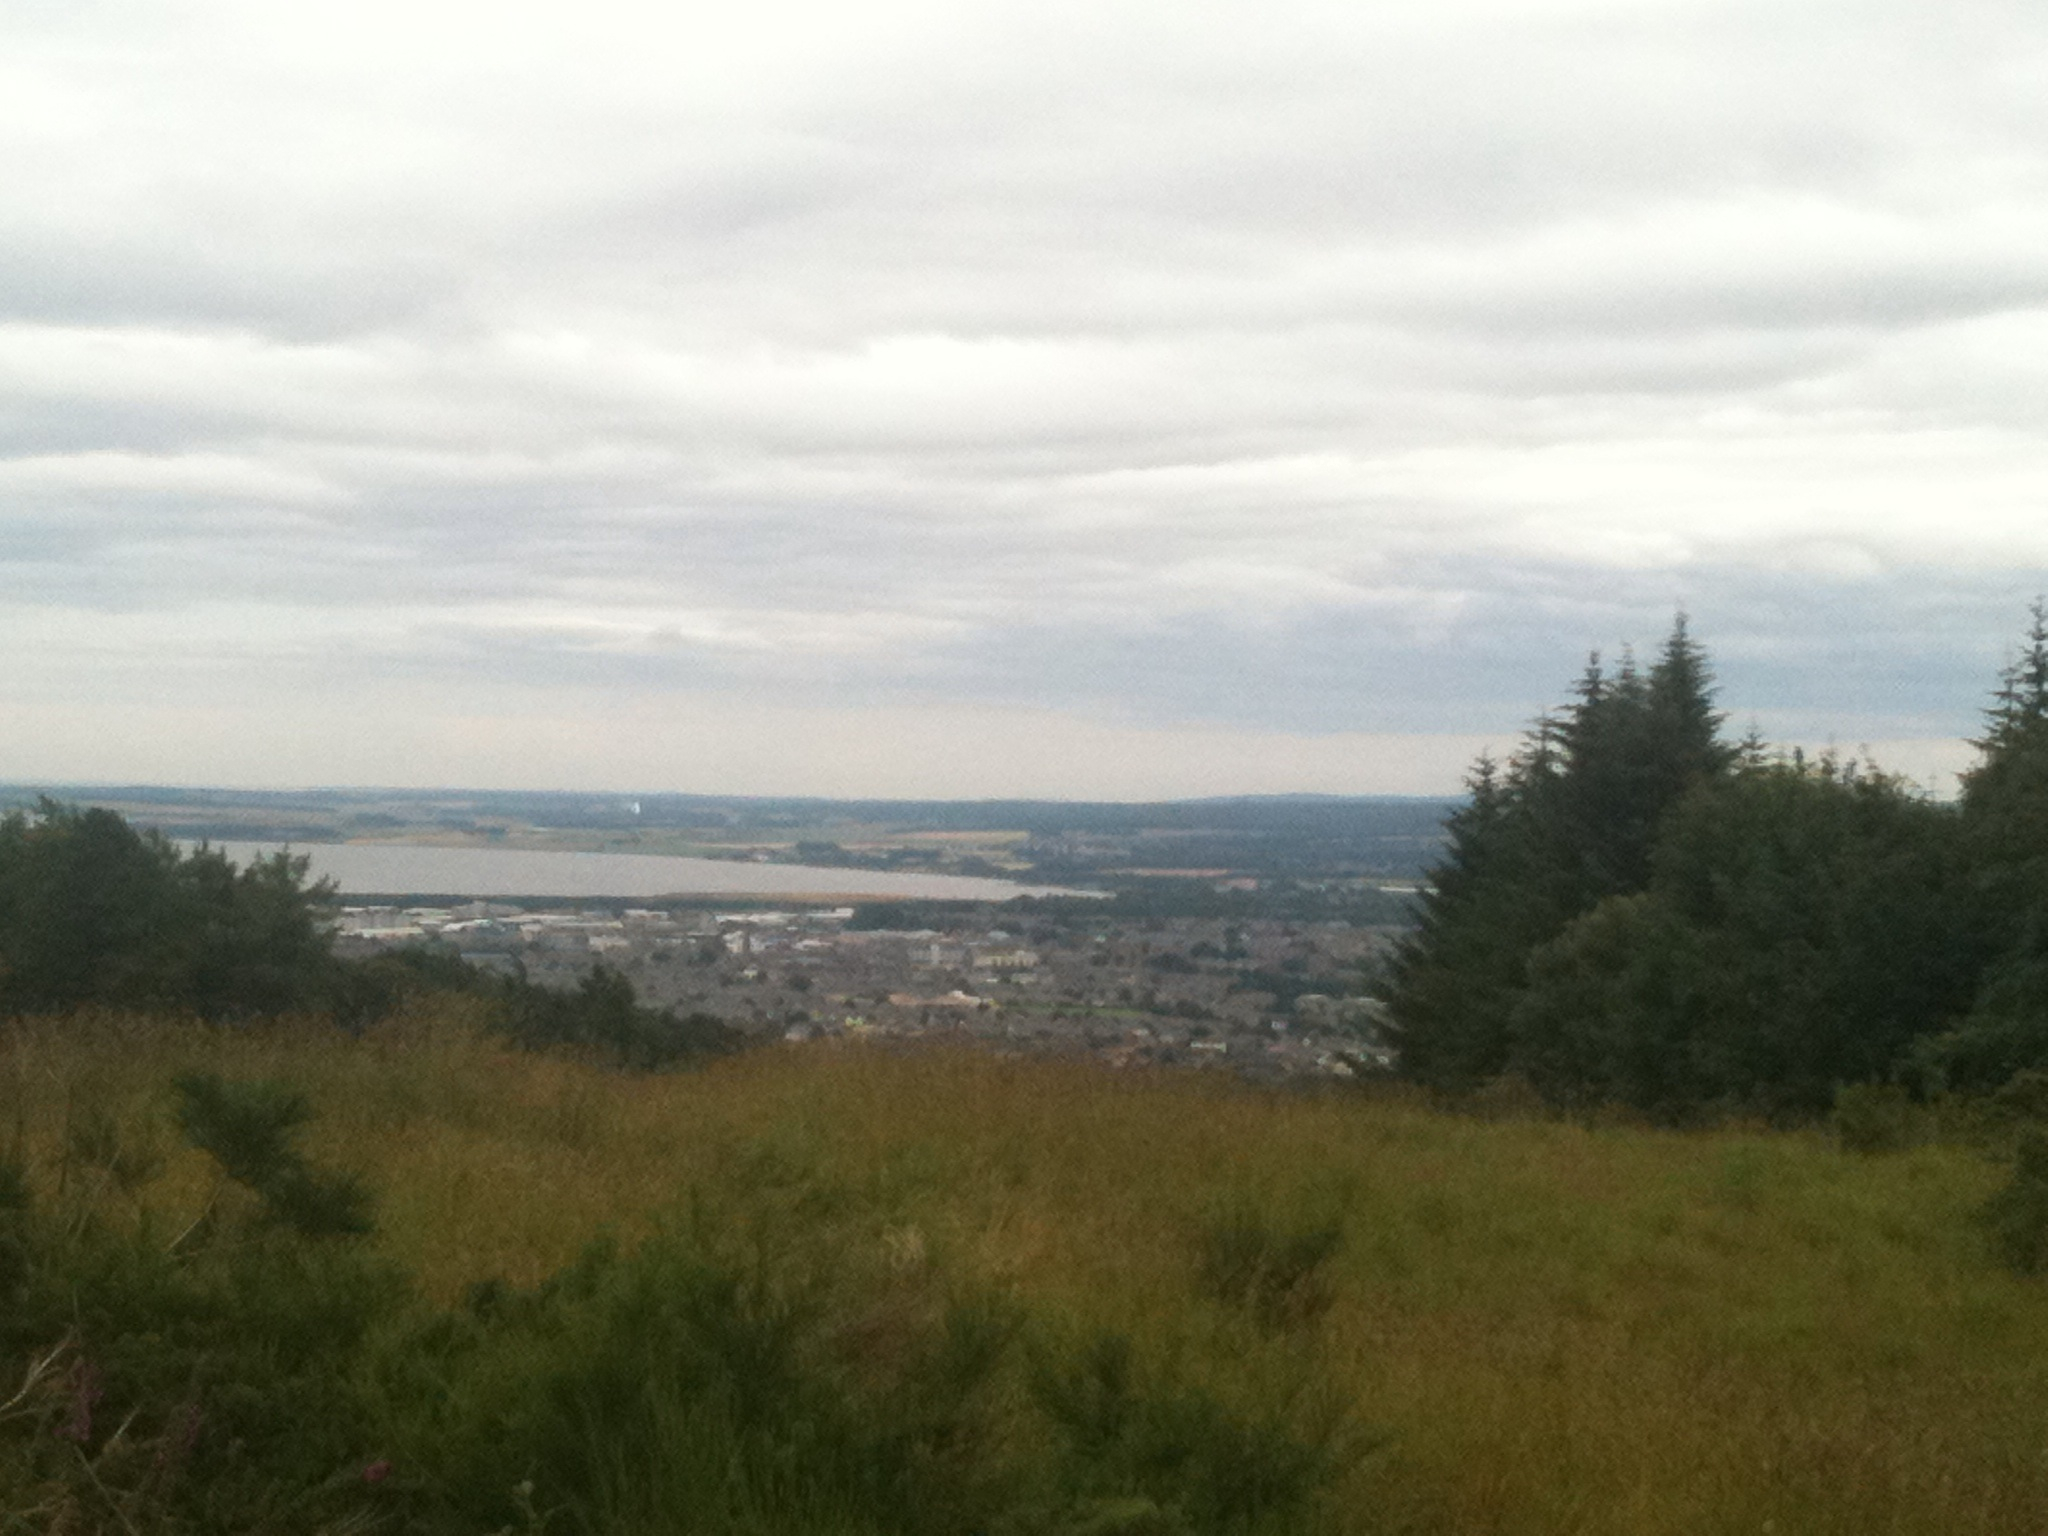 Inverness below